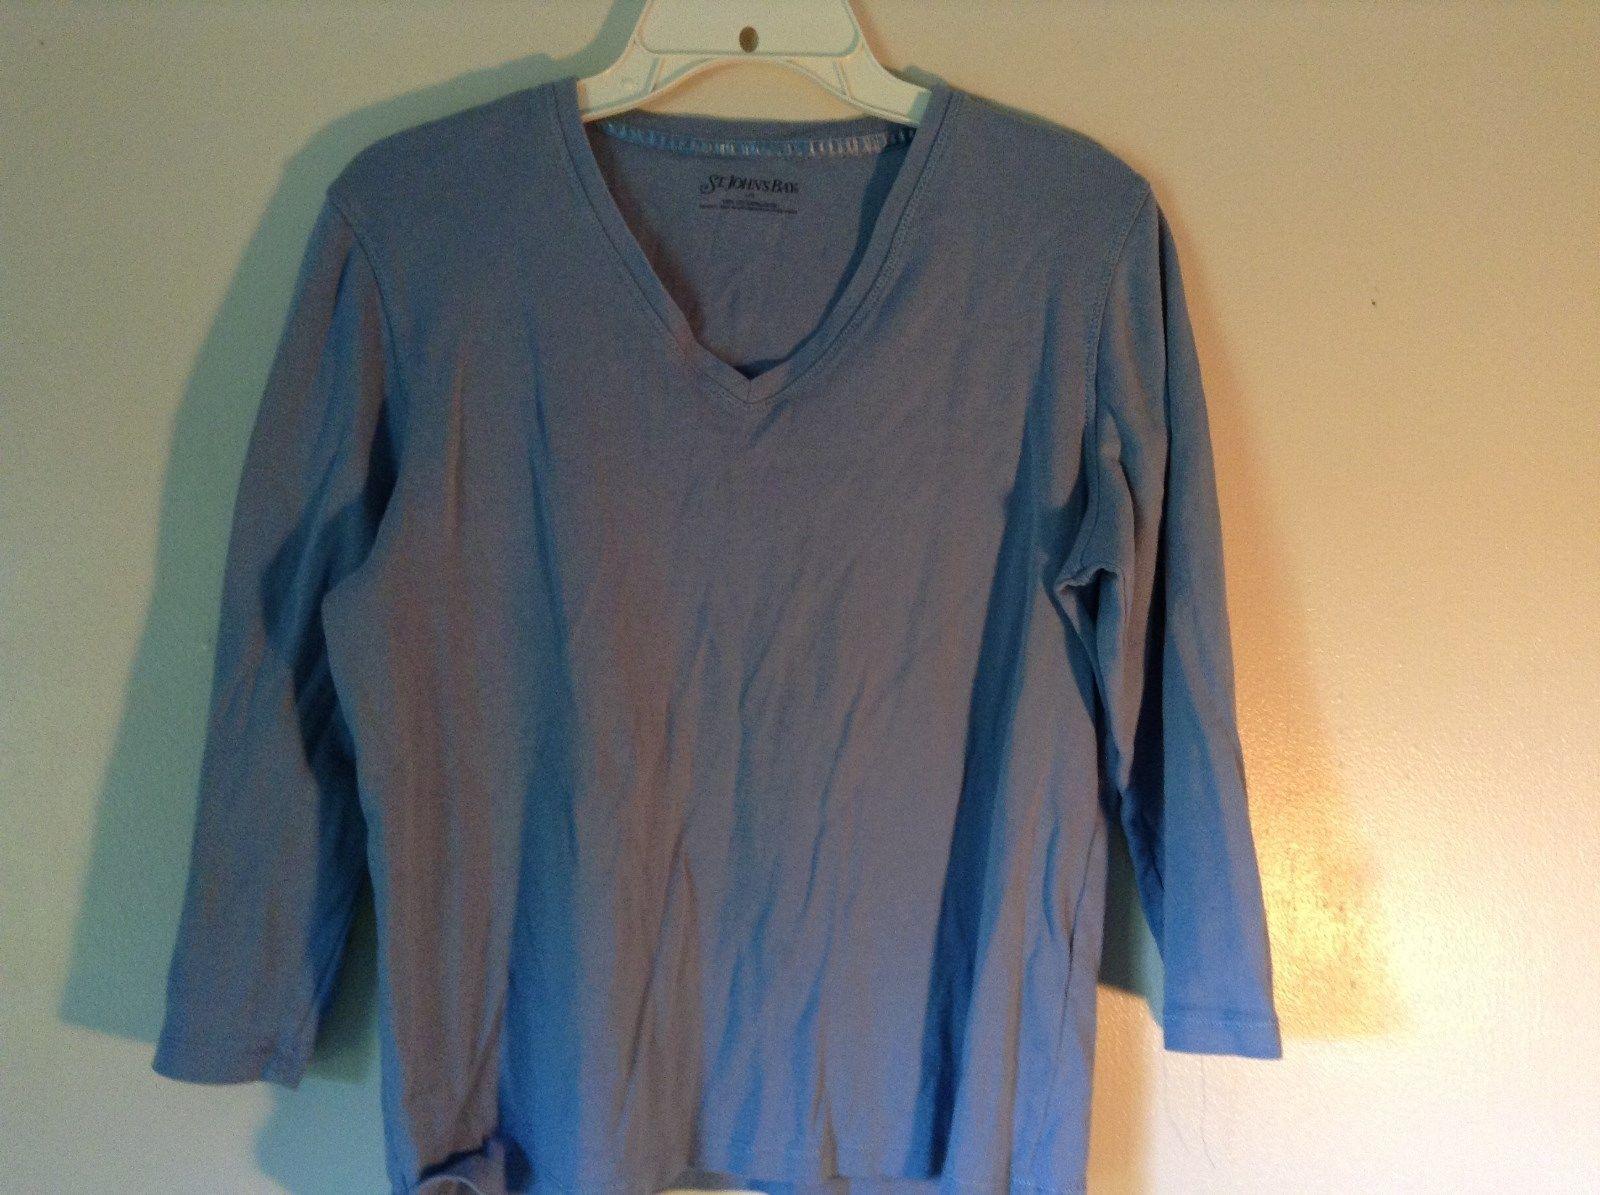 Blue St Johns Bay V Neck Three Quarter Length Sleeves Shirt Size Large